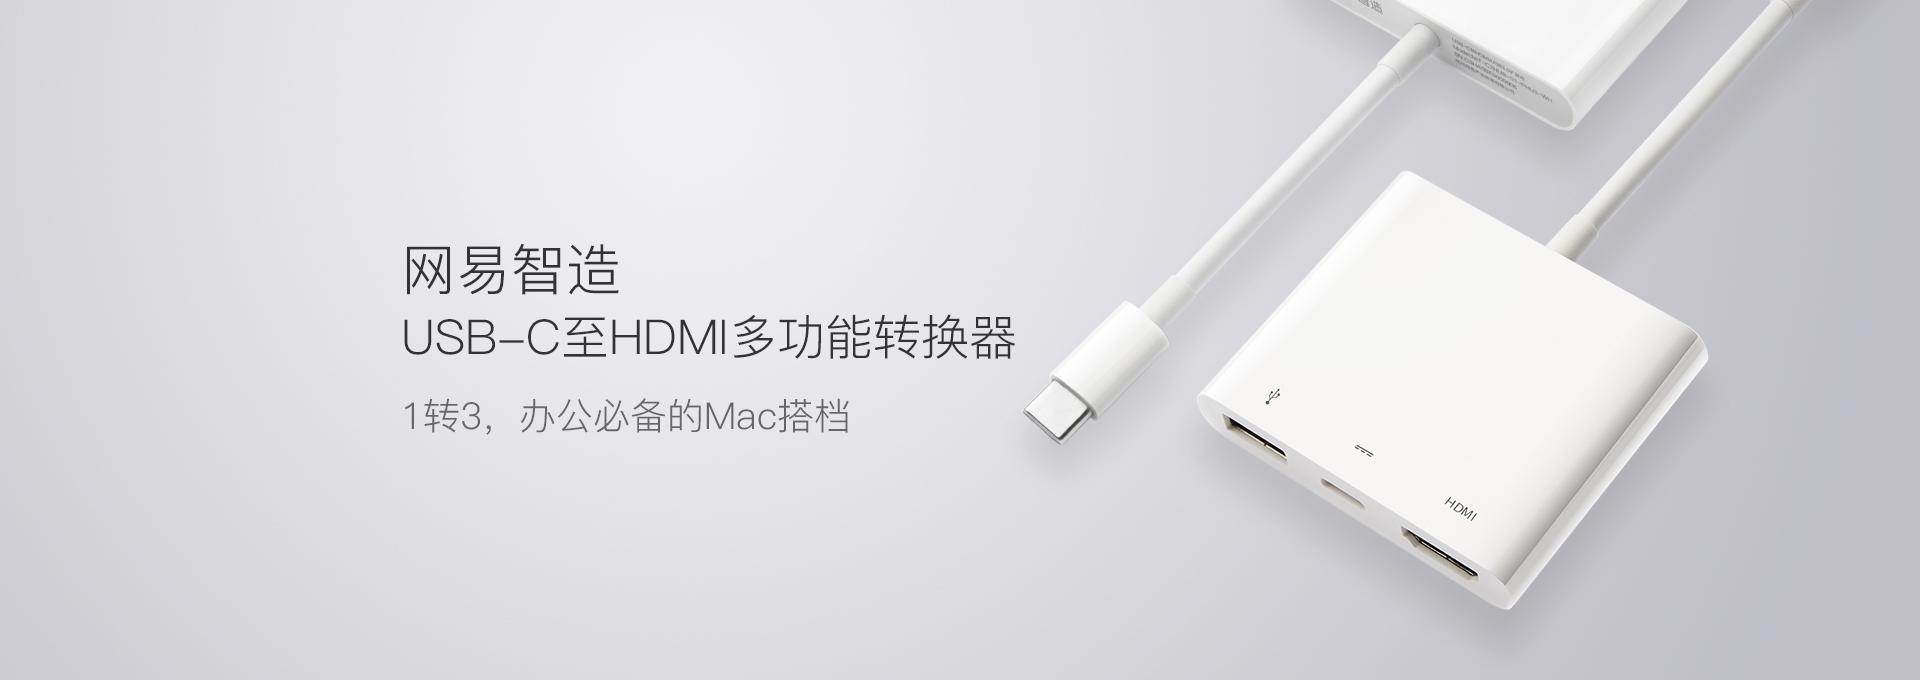 USB-C至HDMI多功能转换器